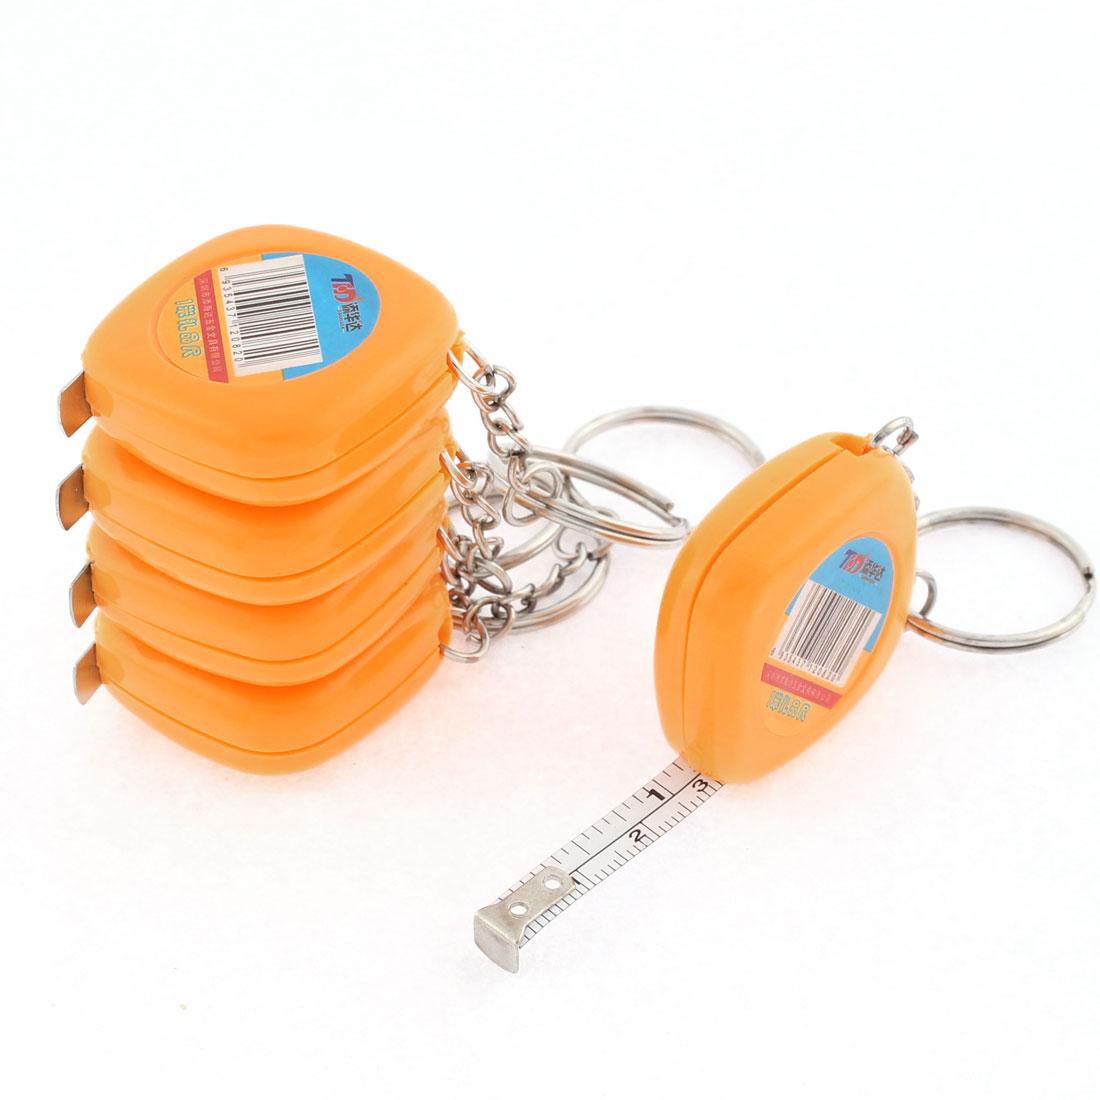 Plastic Case Split Ring Retractable Metric Ruler Tape 1M 3Ft Orange 5 Pcs